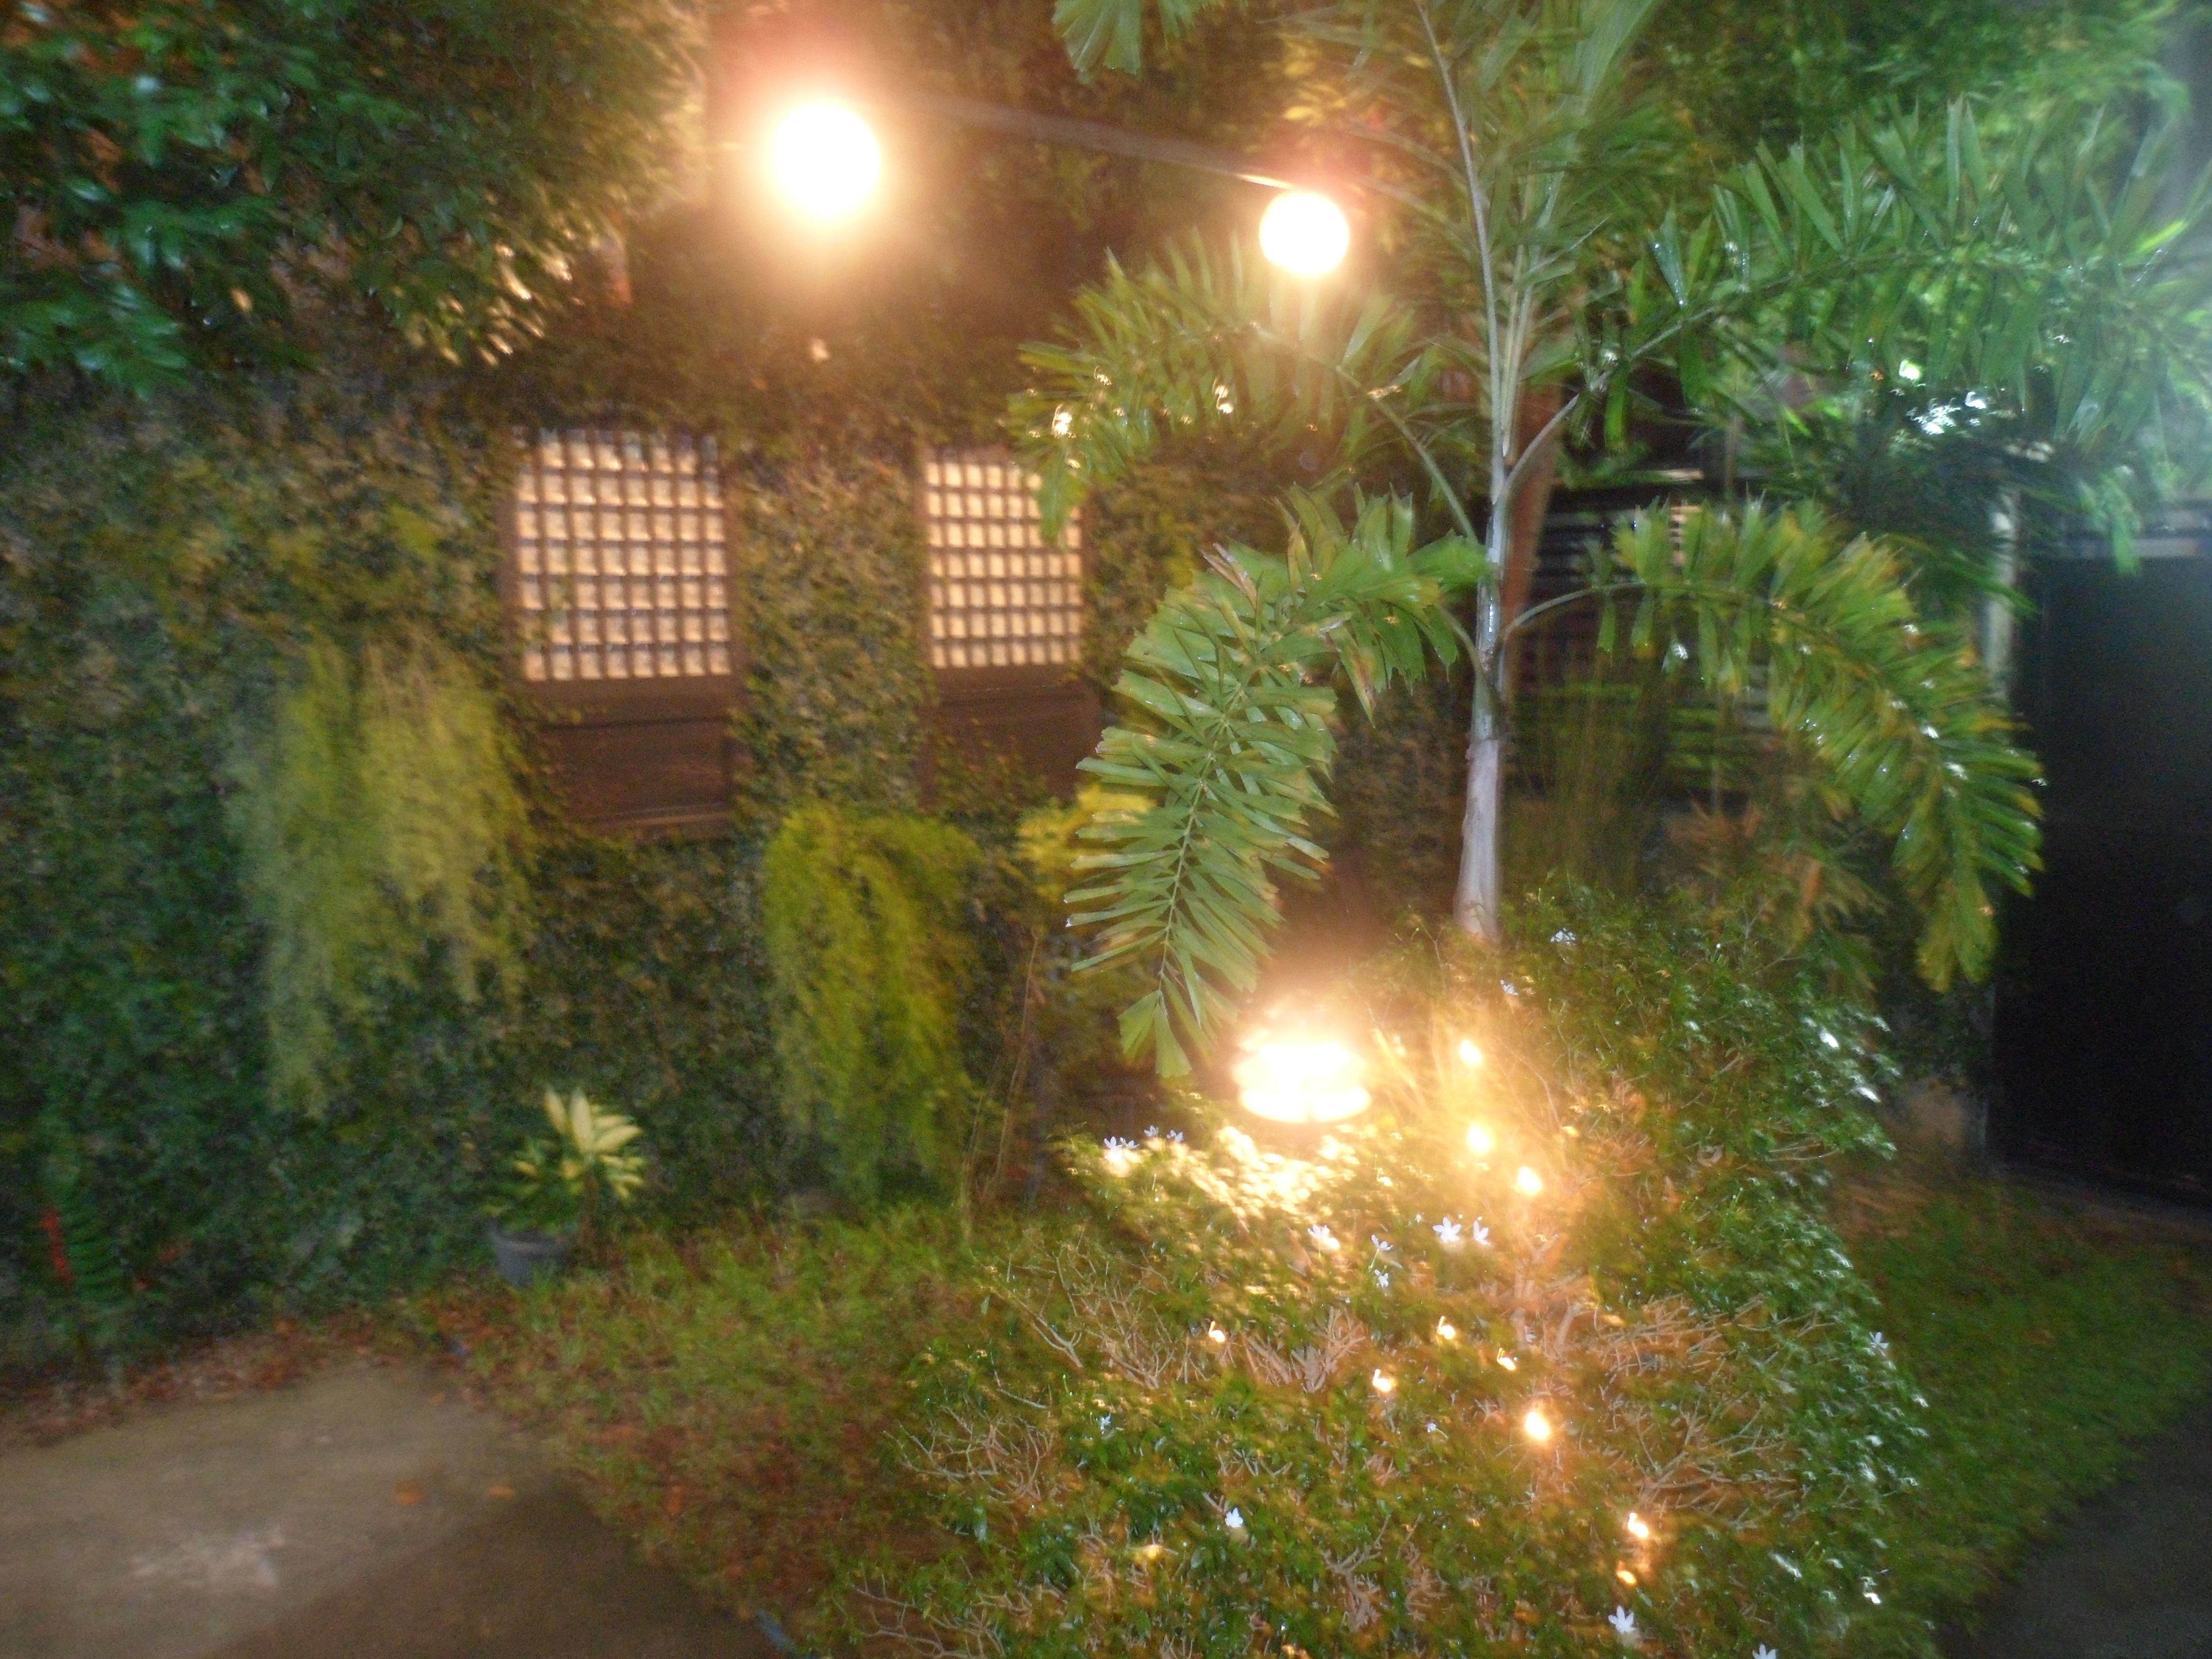 Night life in our little garden. | My Garden | Pinterest | Night life